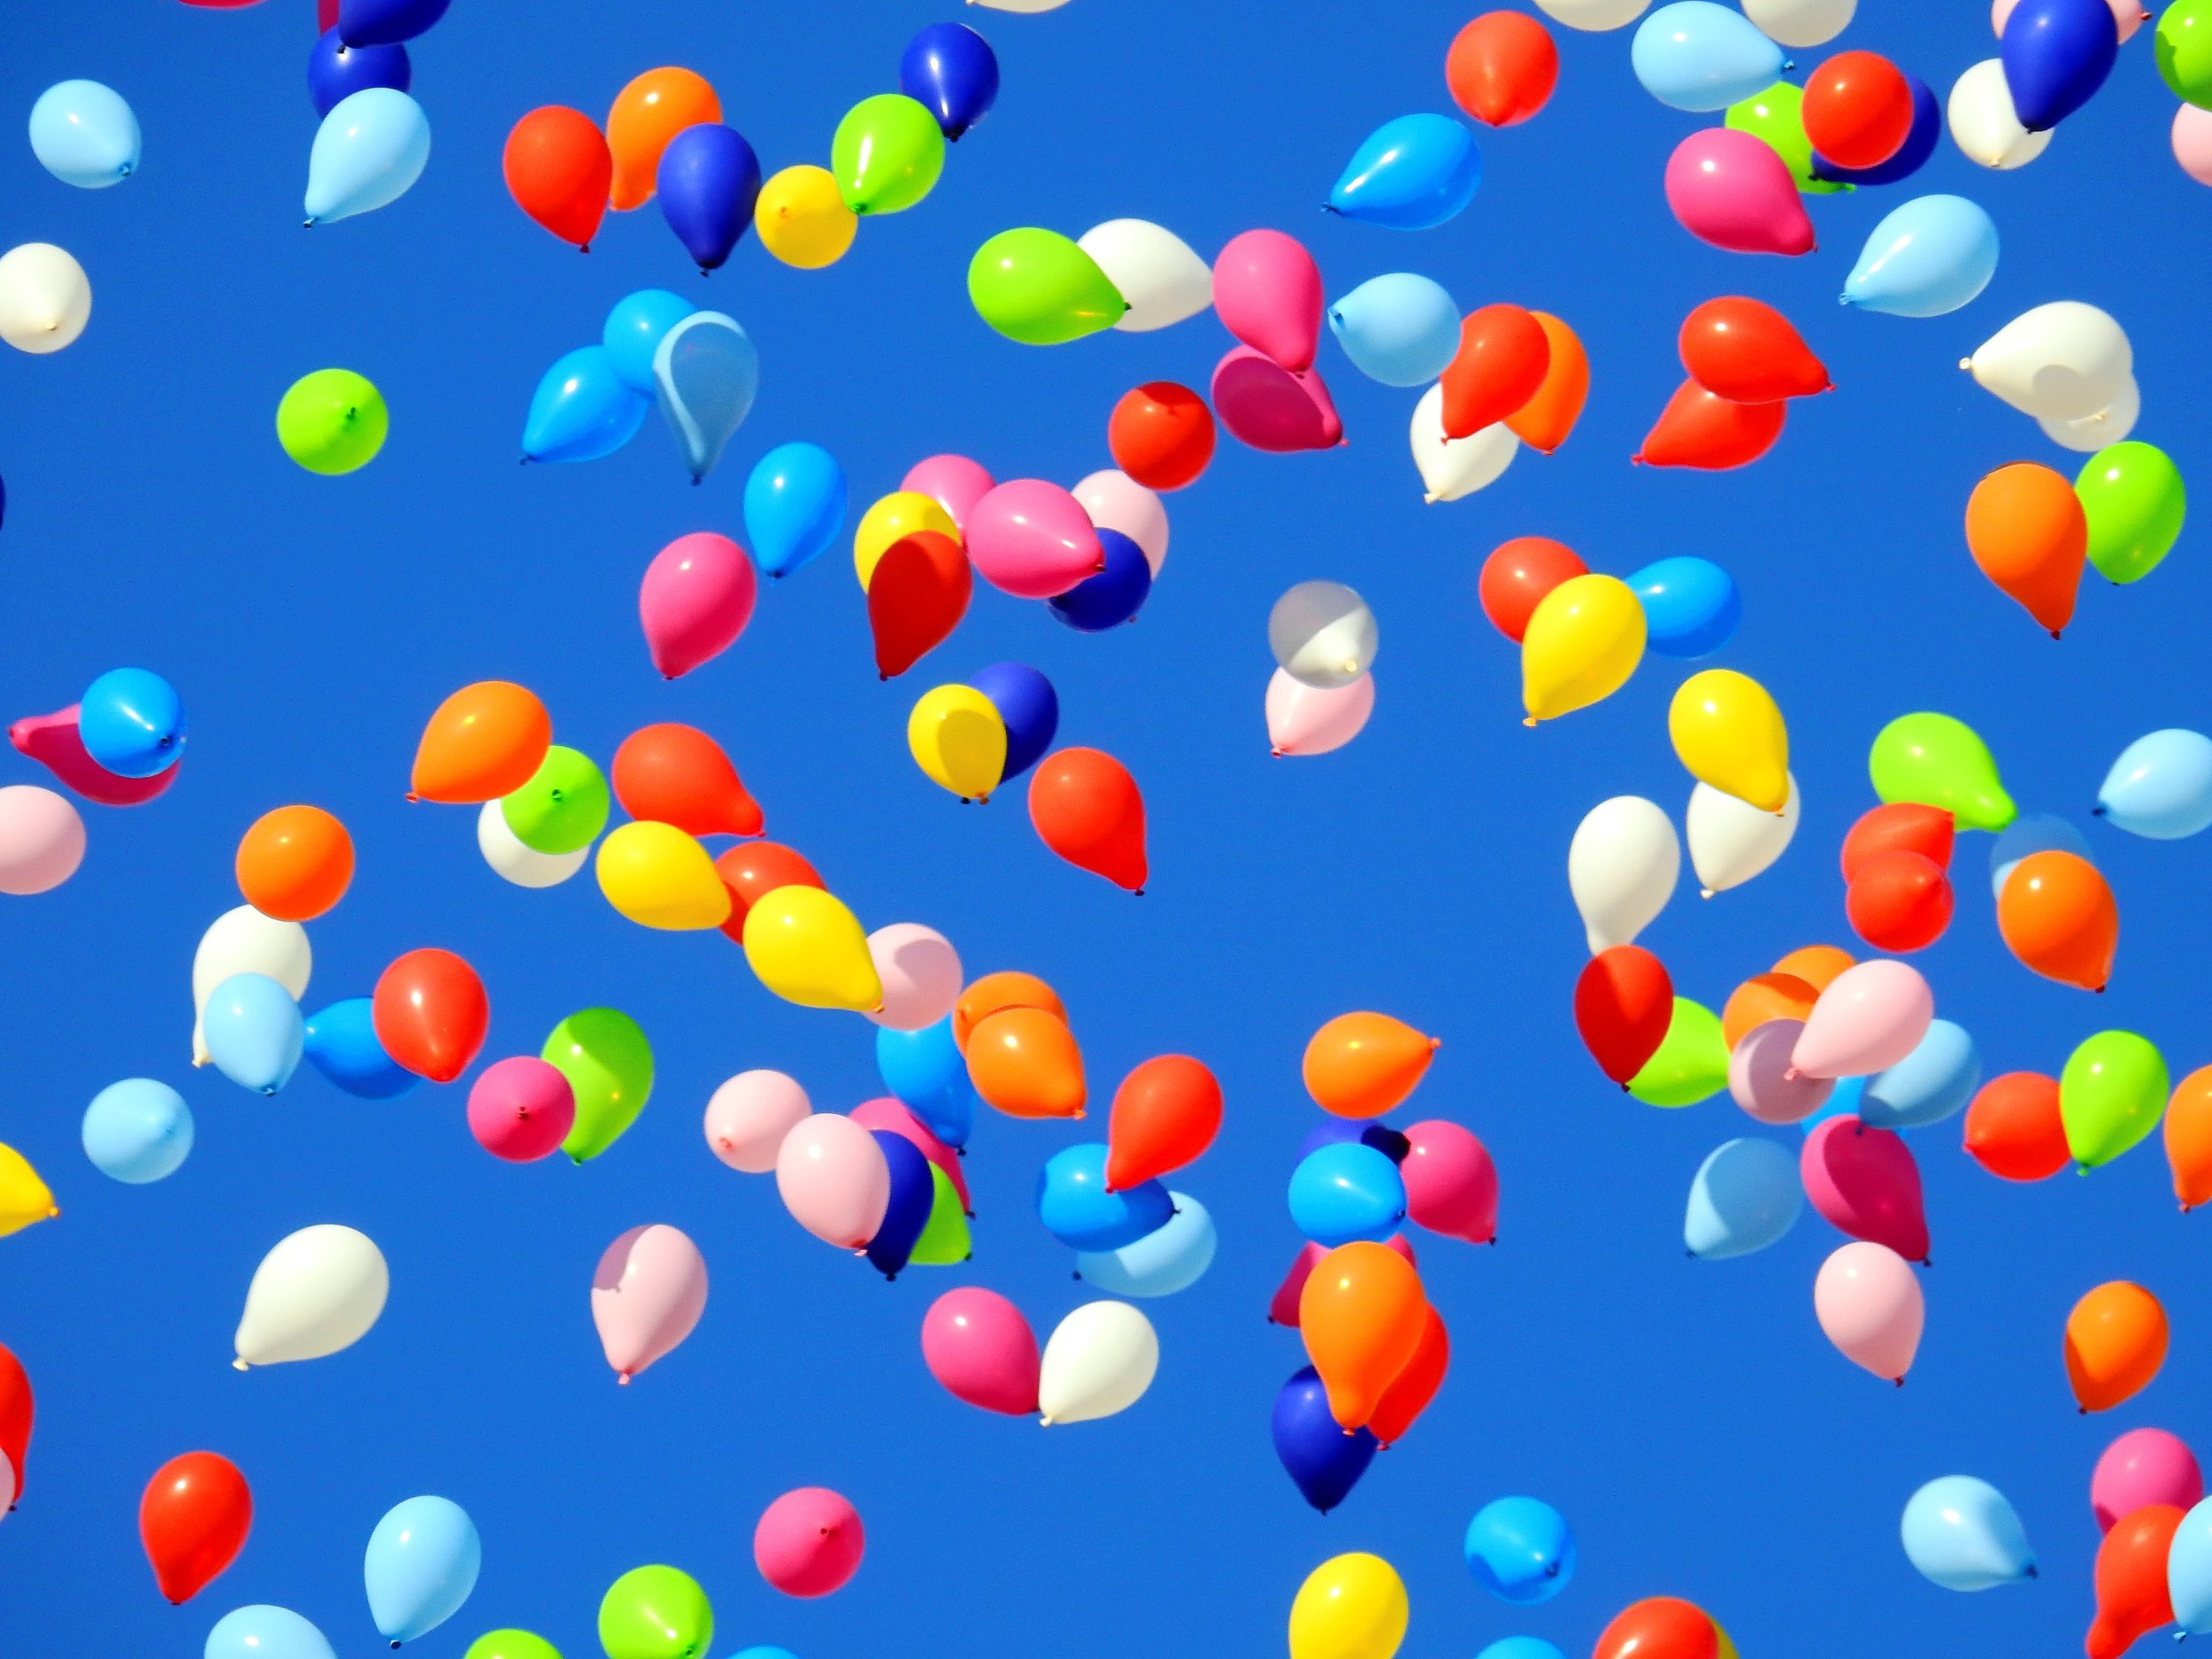 sky-petal-balloon-celebration-food-carnival-1181844-pxhere.com.jpg